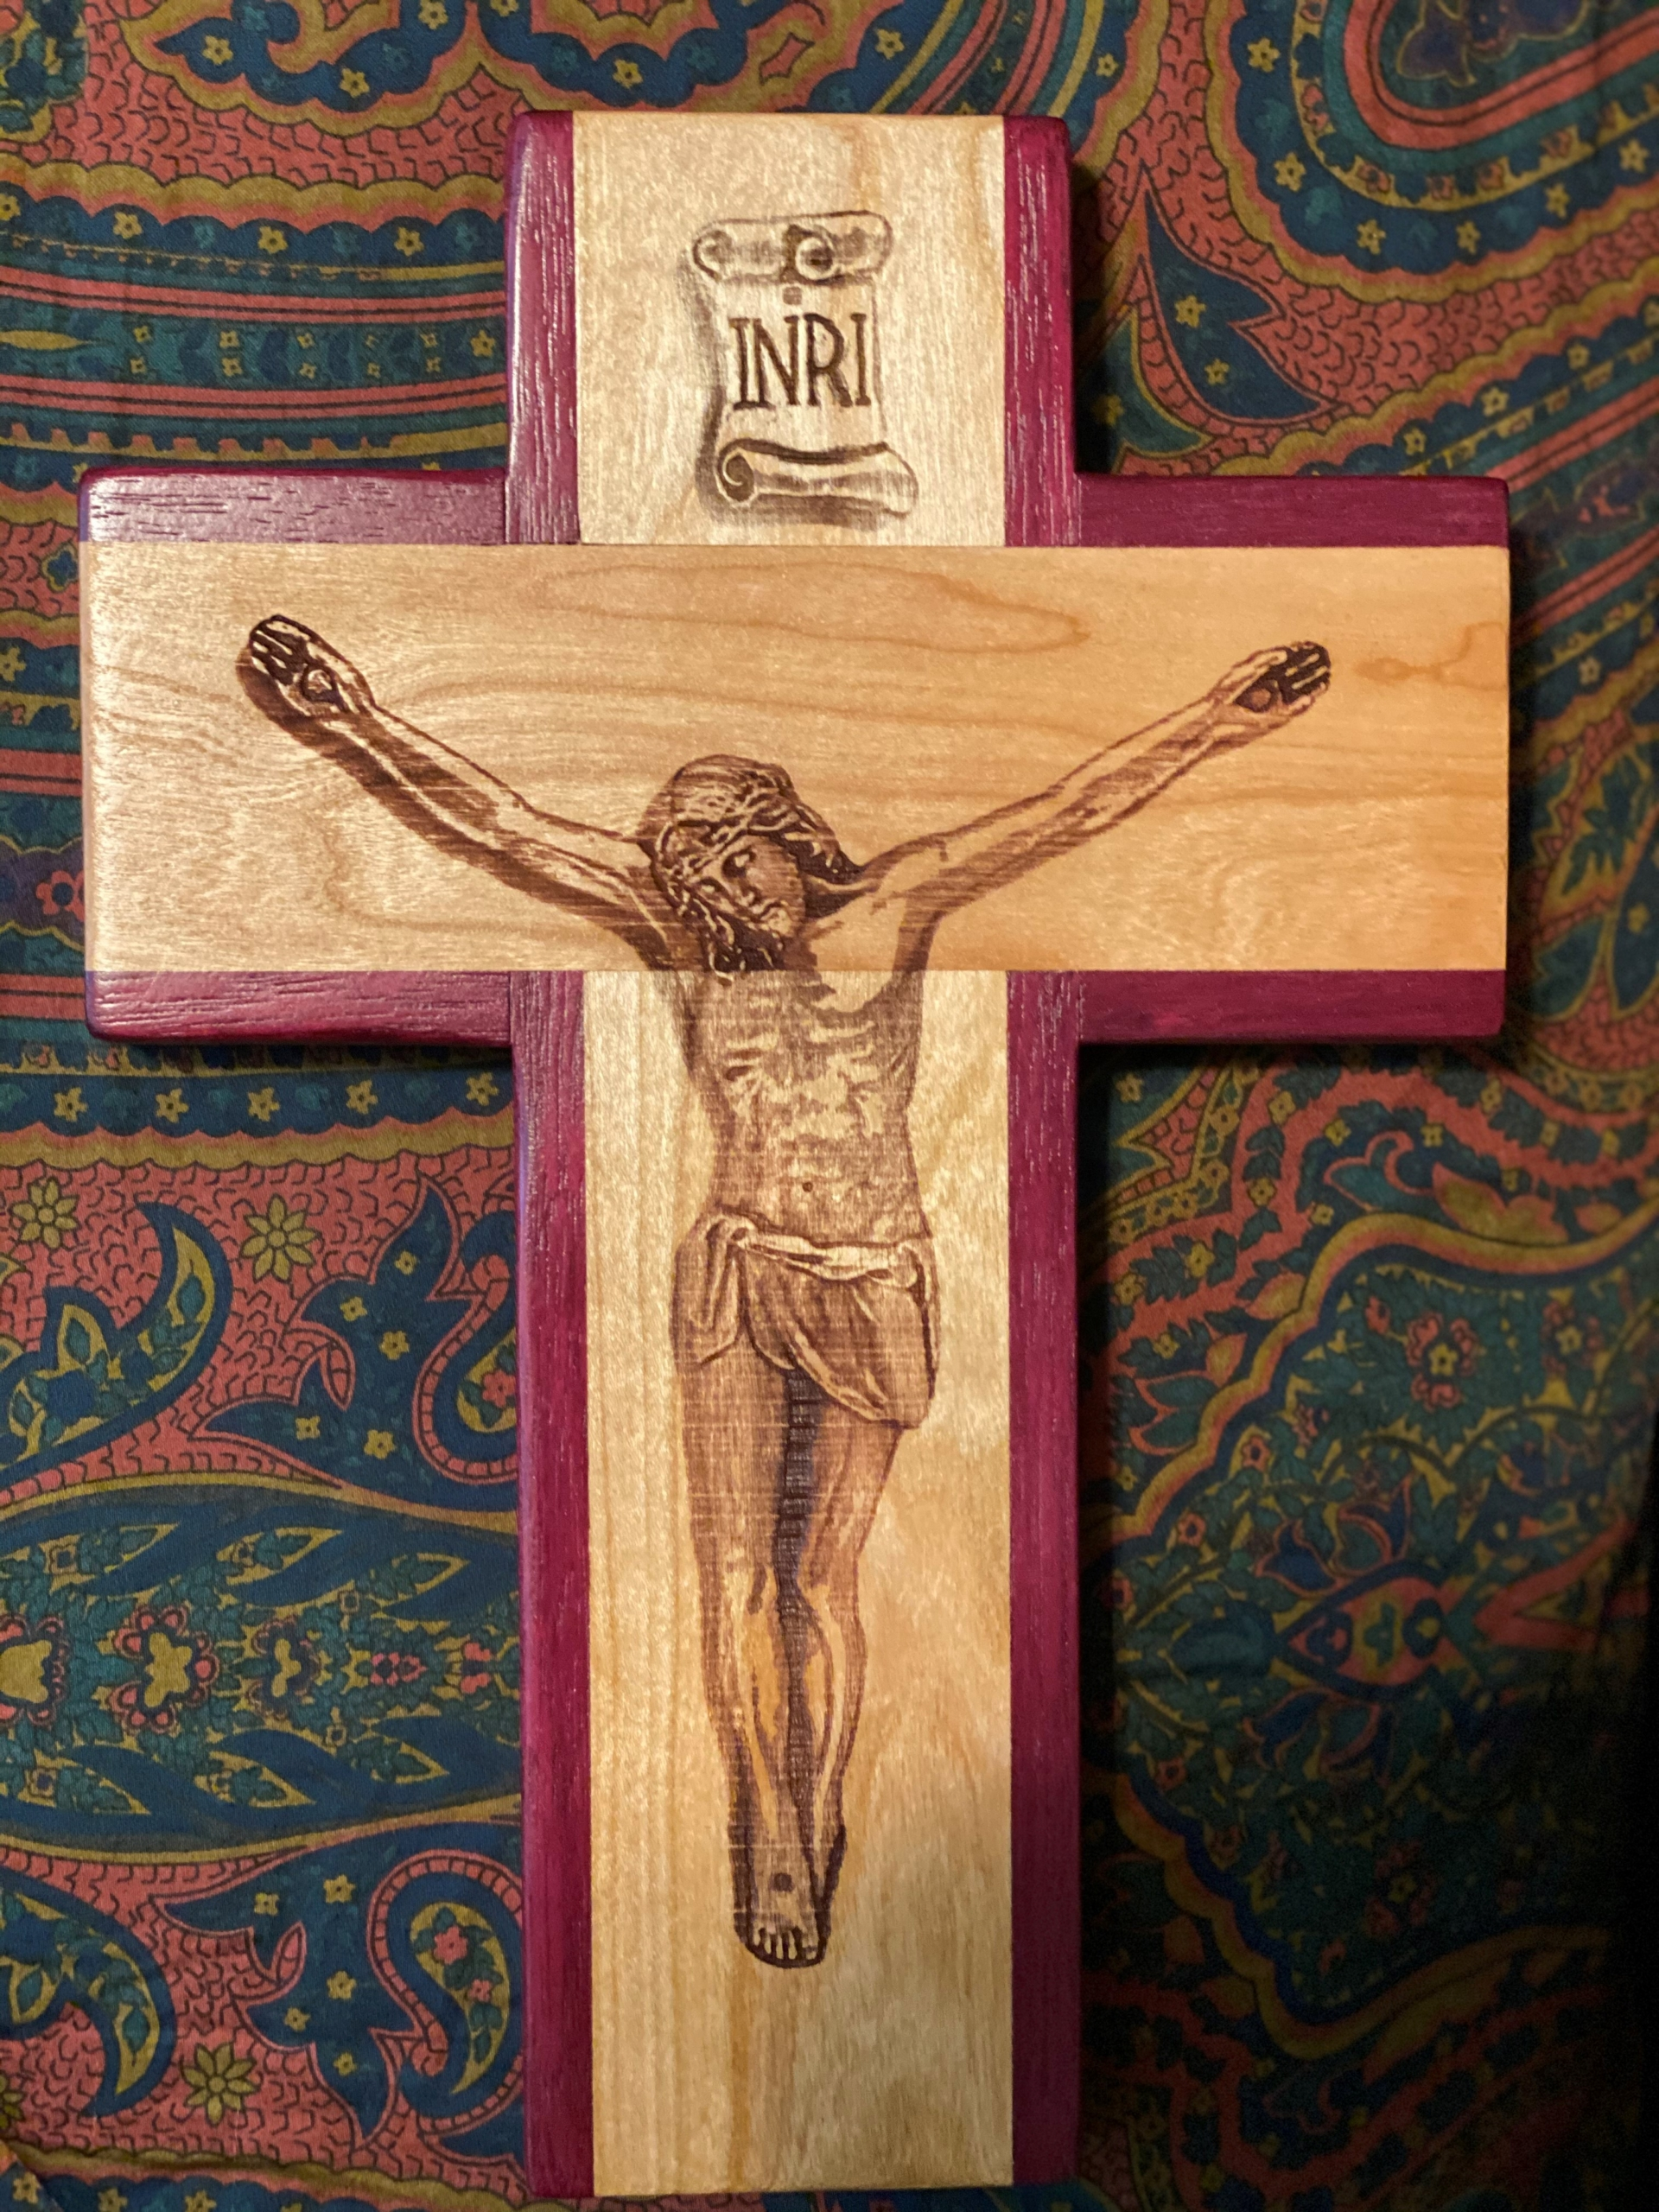 The HBREA 2021 Gala Auction Items - Jesus Christ